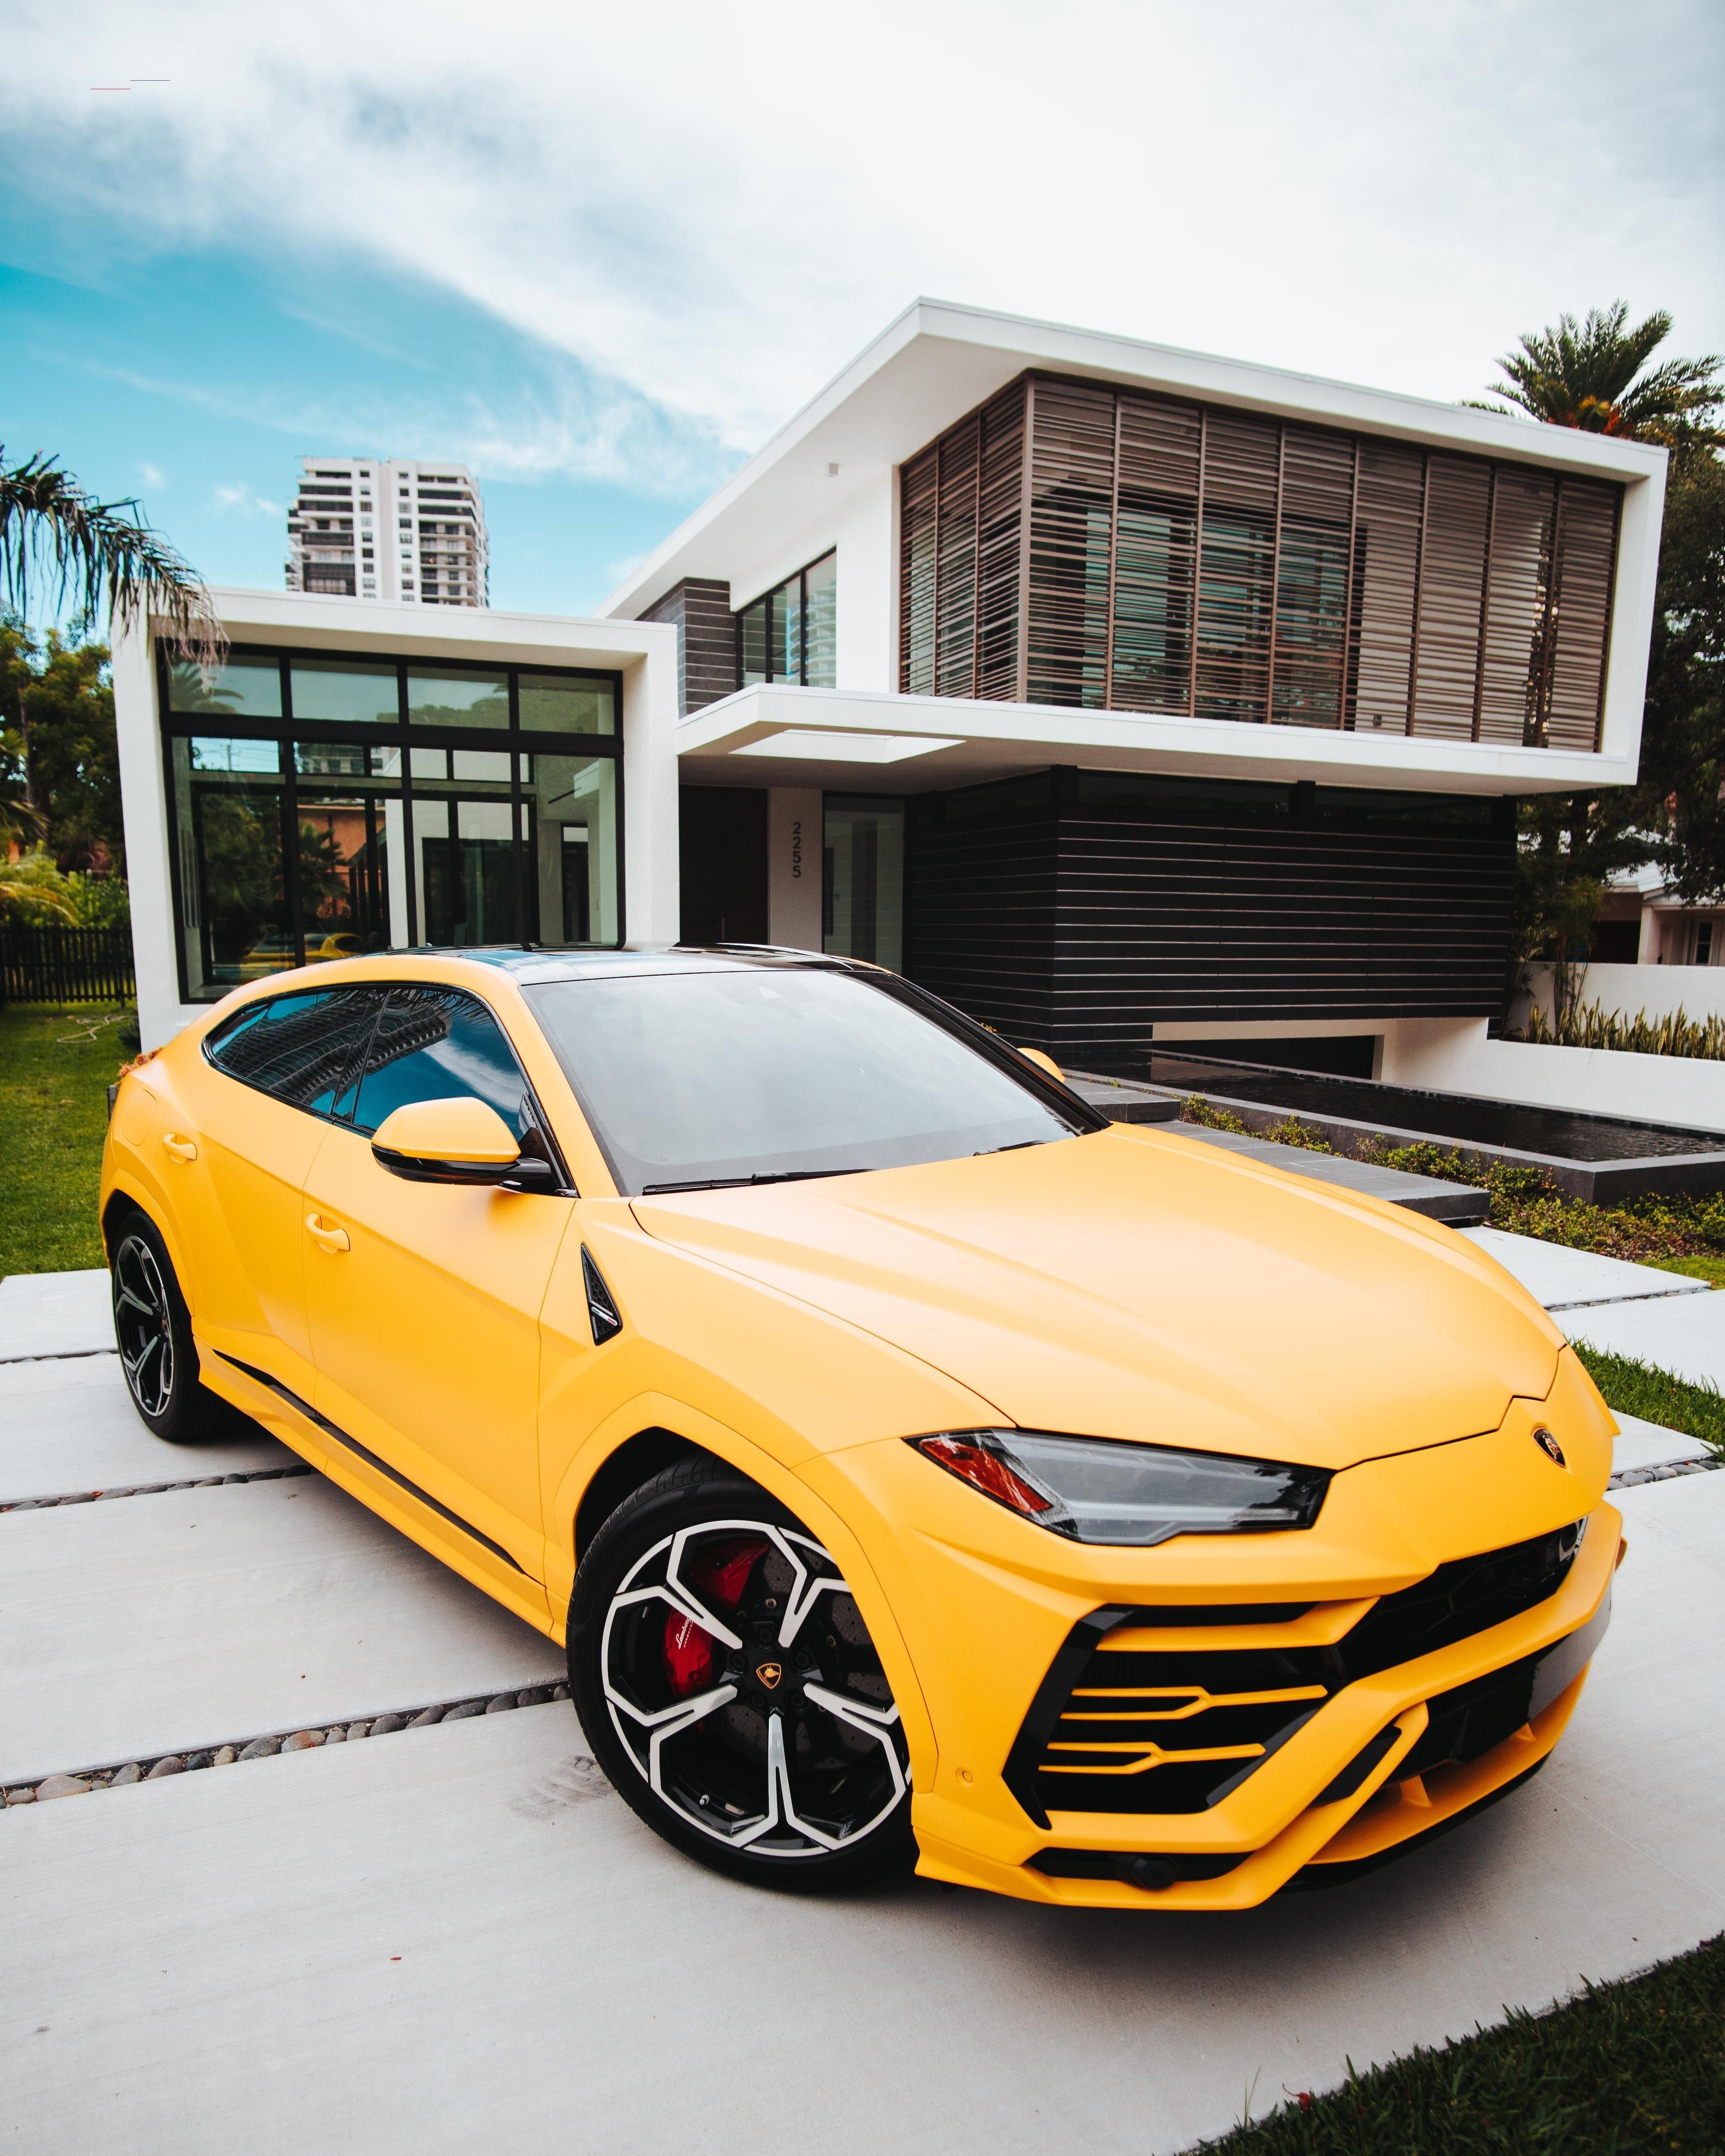 Yellow Lamborghini Urus Luxurycars At Paramount Luxury Rentals We Have A Beautiful Lamborghini Urus Rental List Of Luxury Cars New Sports Cars Luxury Cars